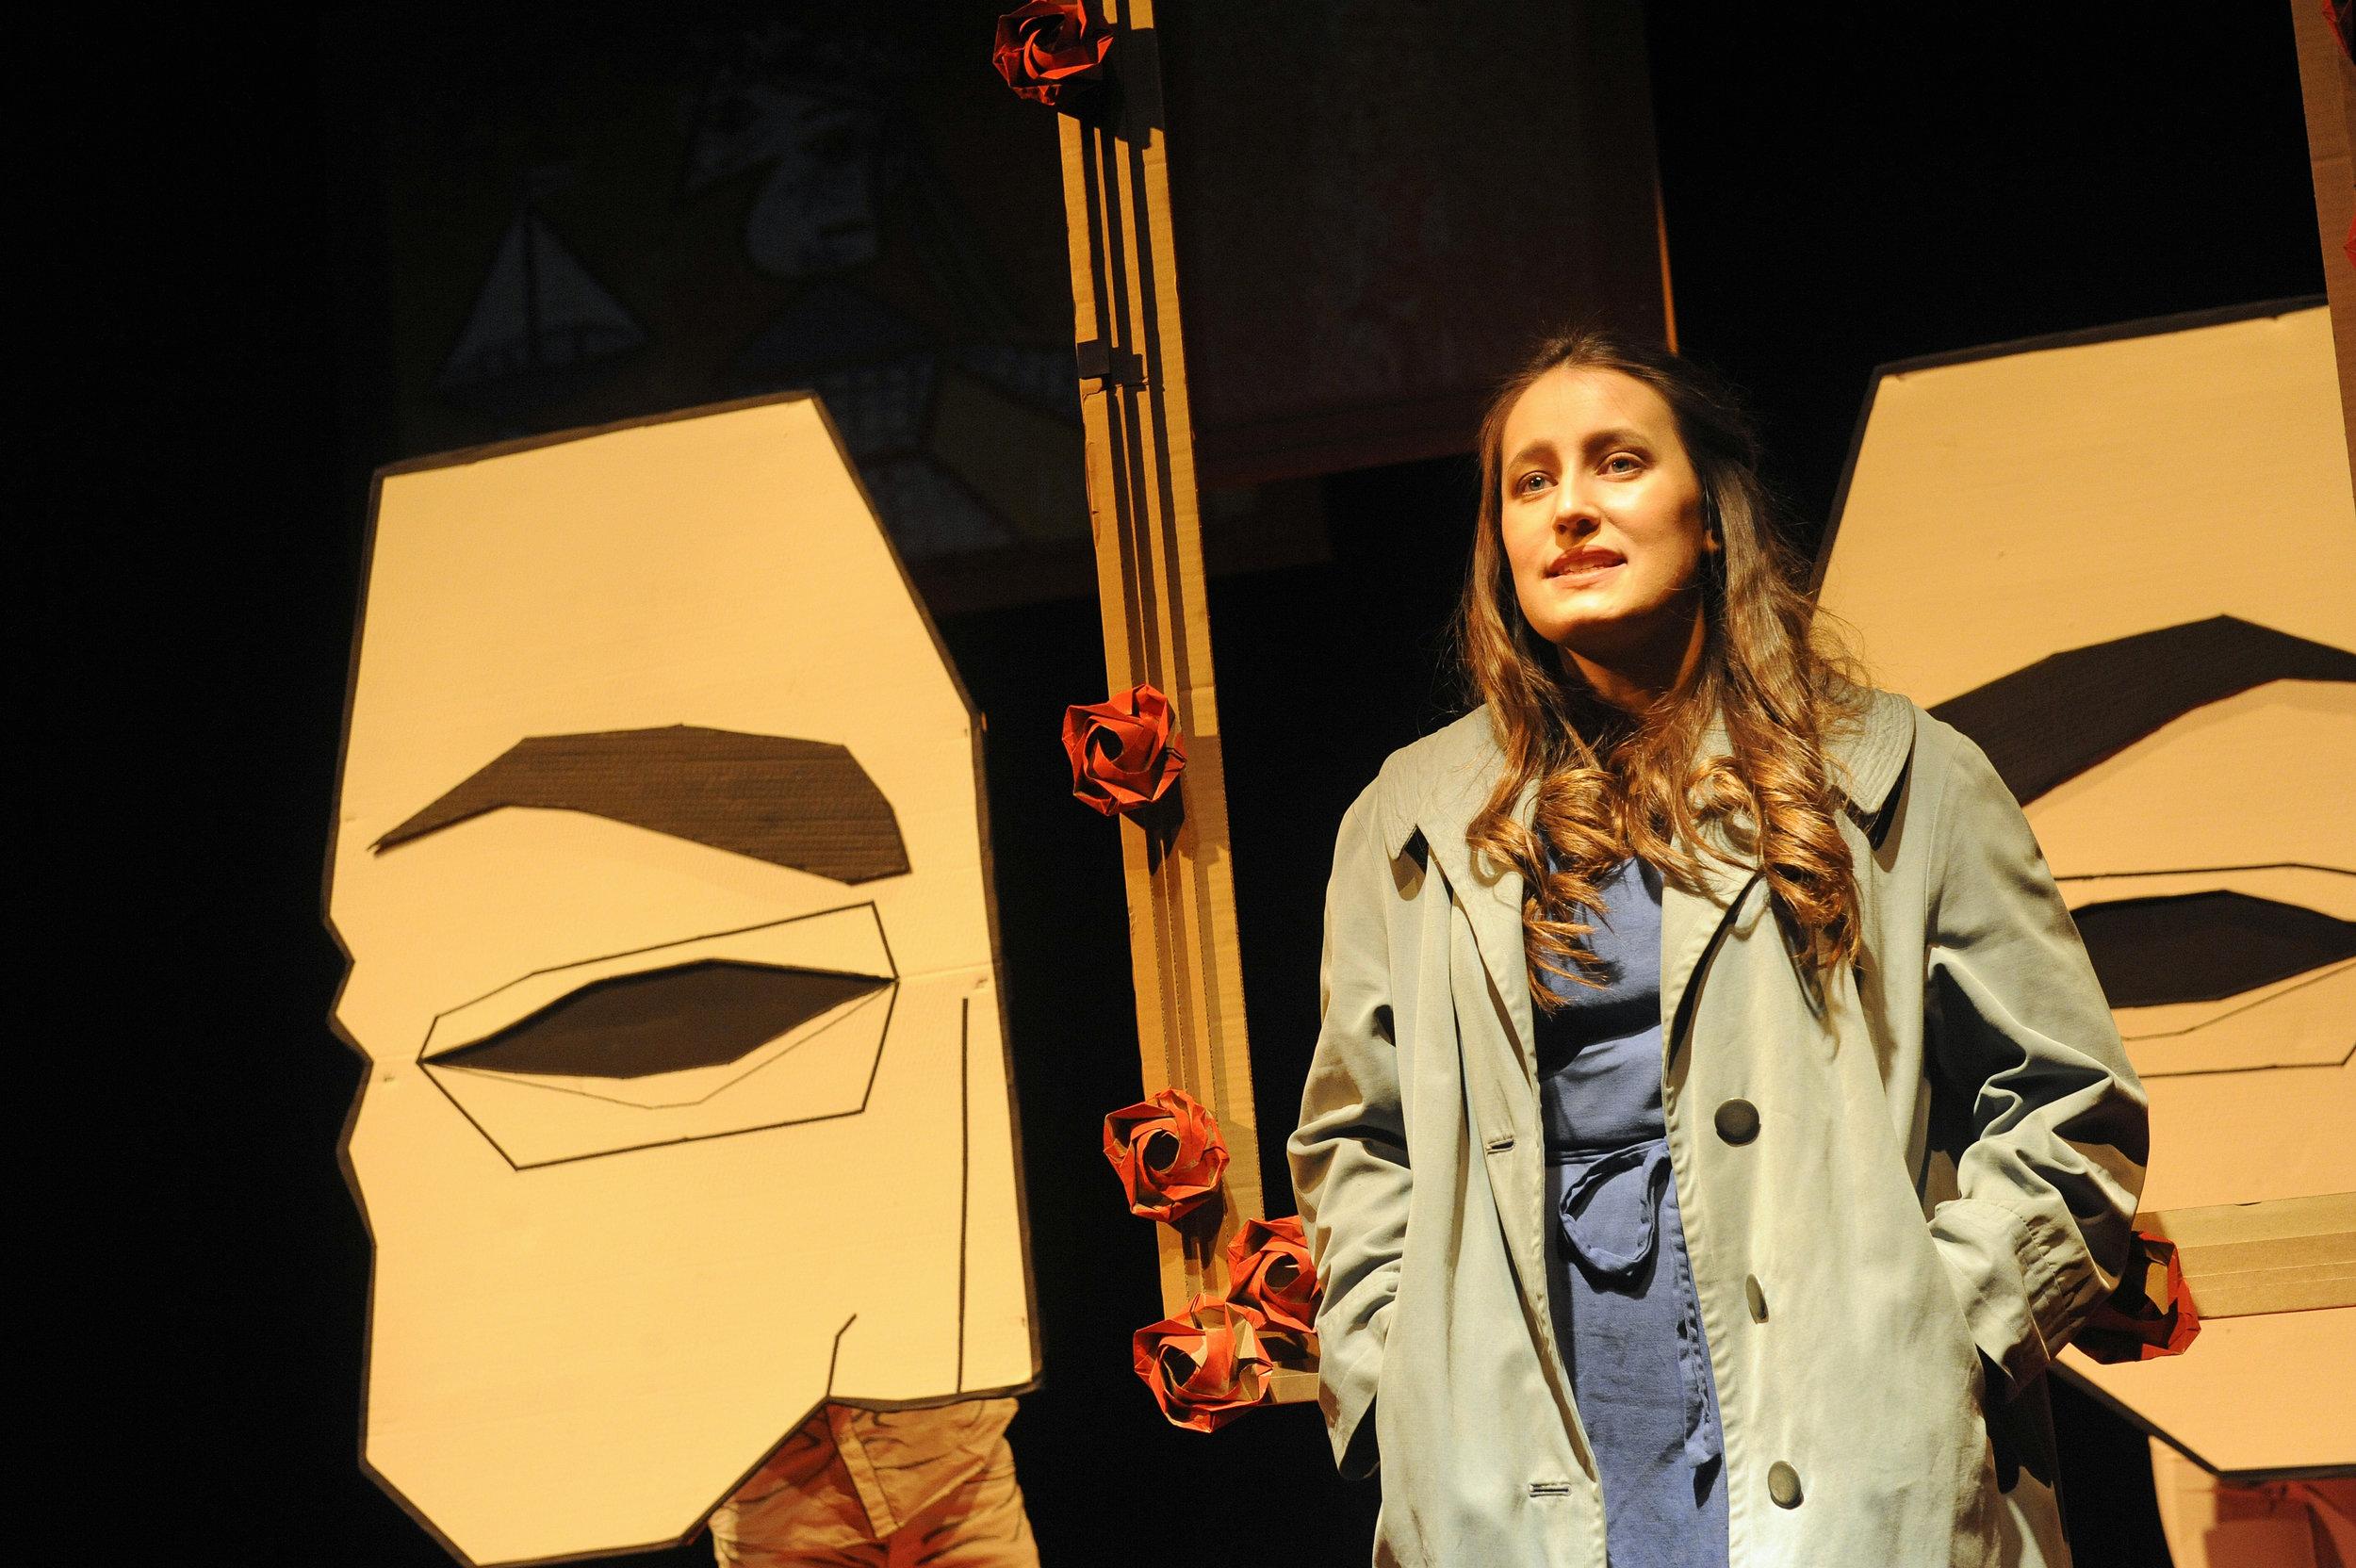 vorn: Lena Hilsdorf; Hinter der Maske: Karin Herrmann, Simon Buchegger